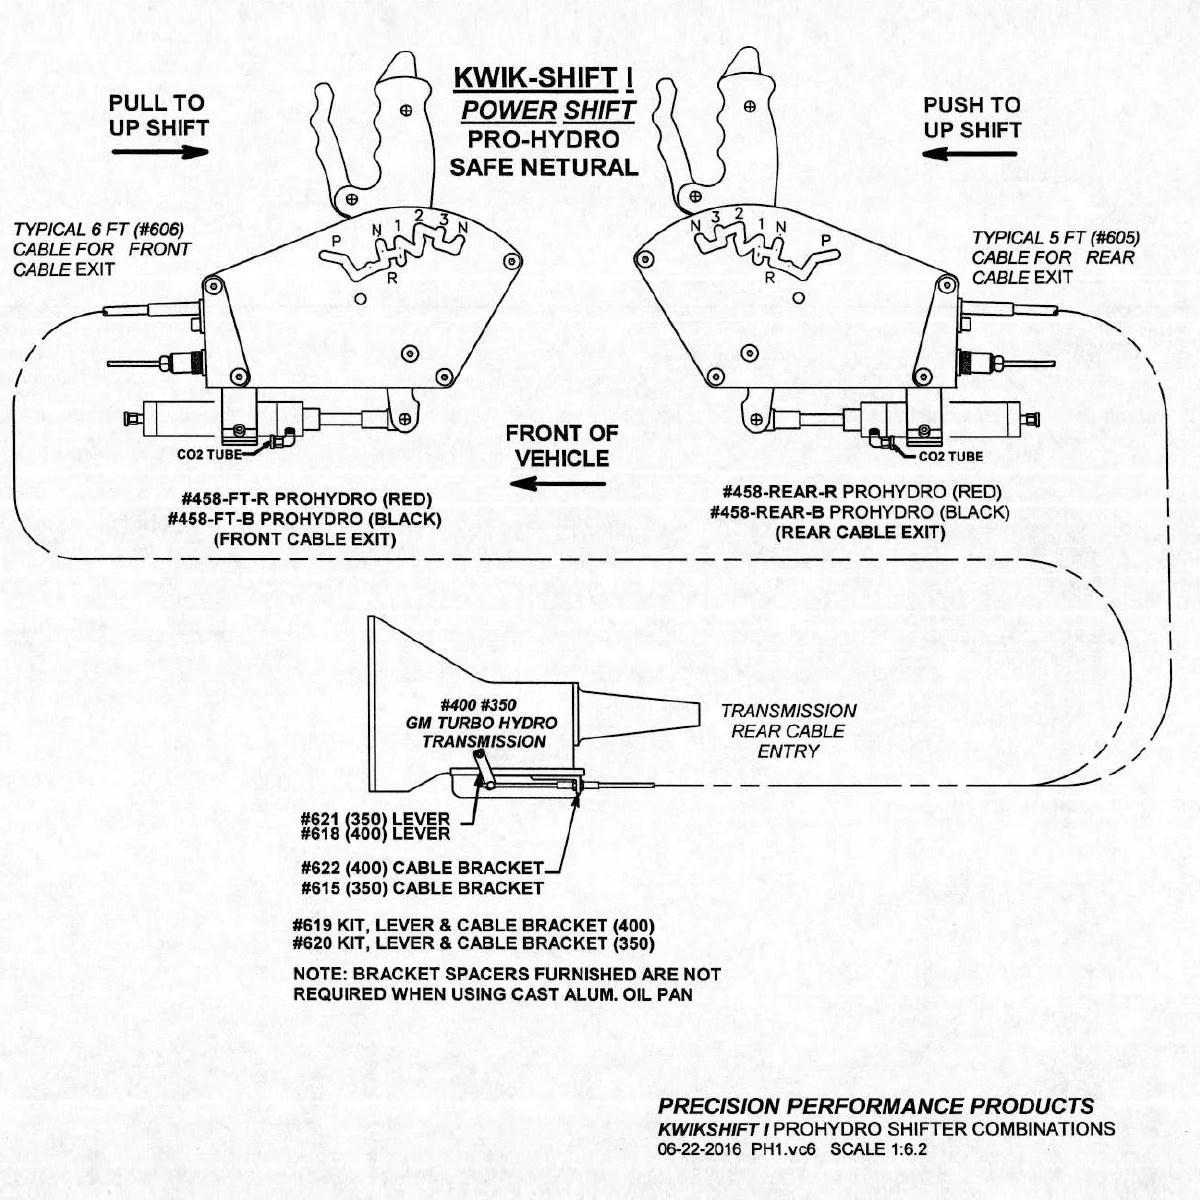 gm th400 transmission diagram wiring diagram third levelturbo 400 transmission wiring diagram wiring diagram todays th400 [ 1200 x 1200 Pixel ]